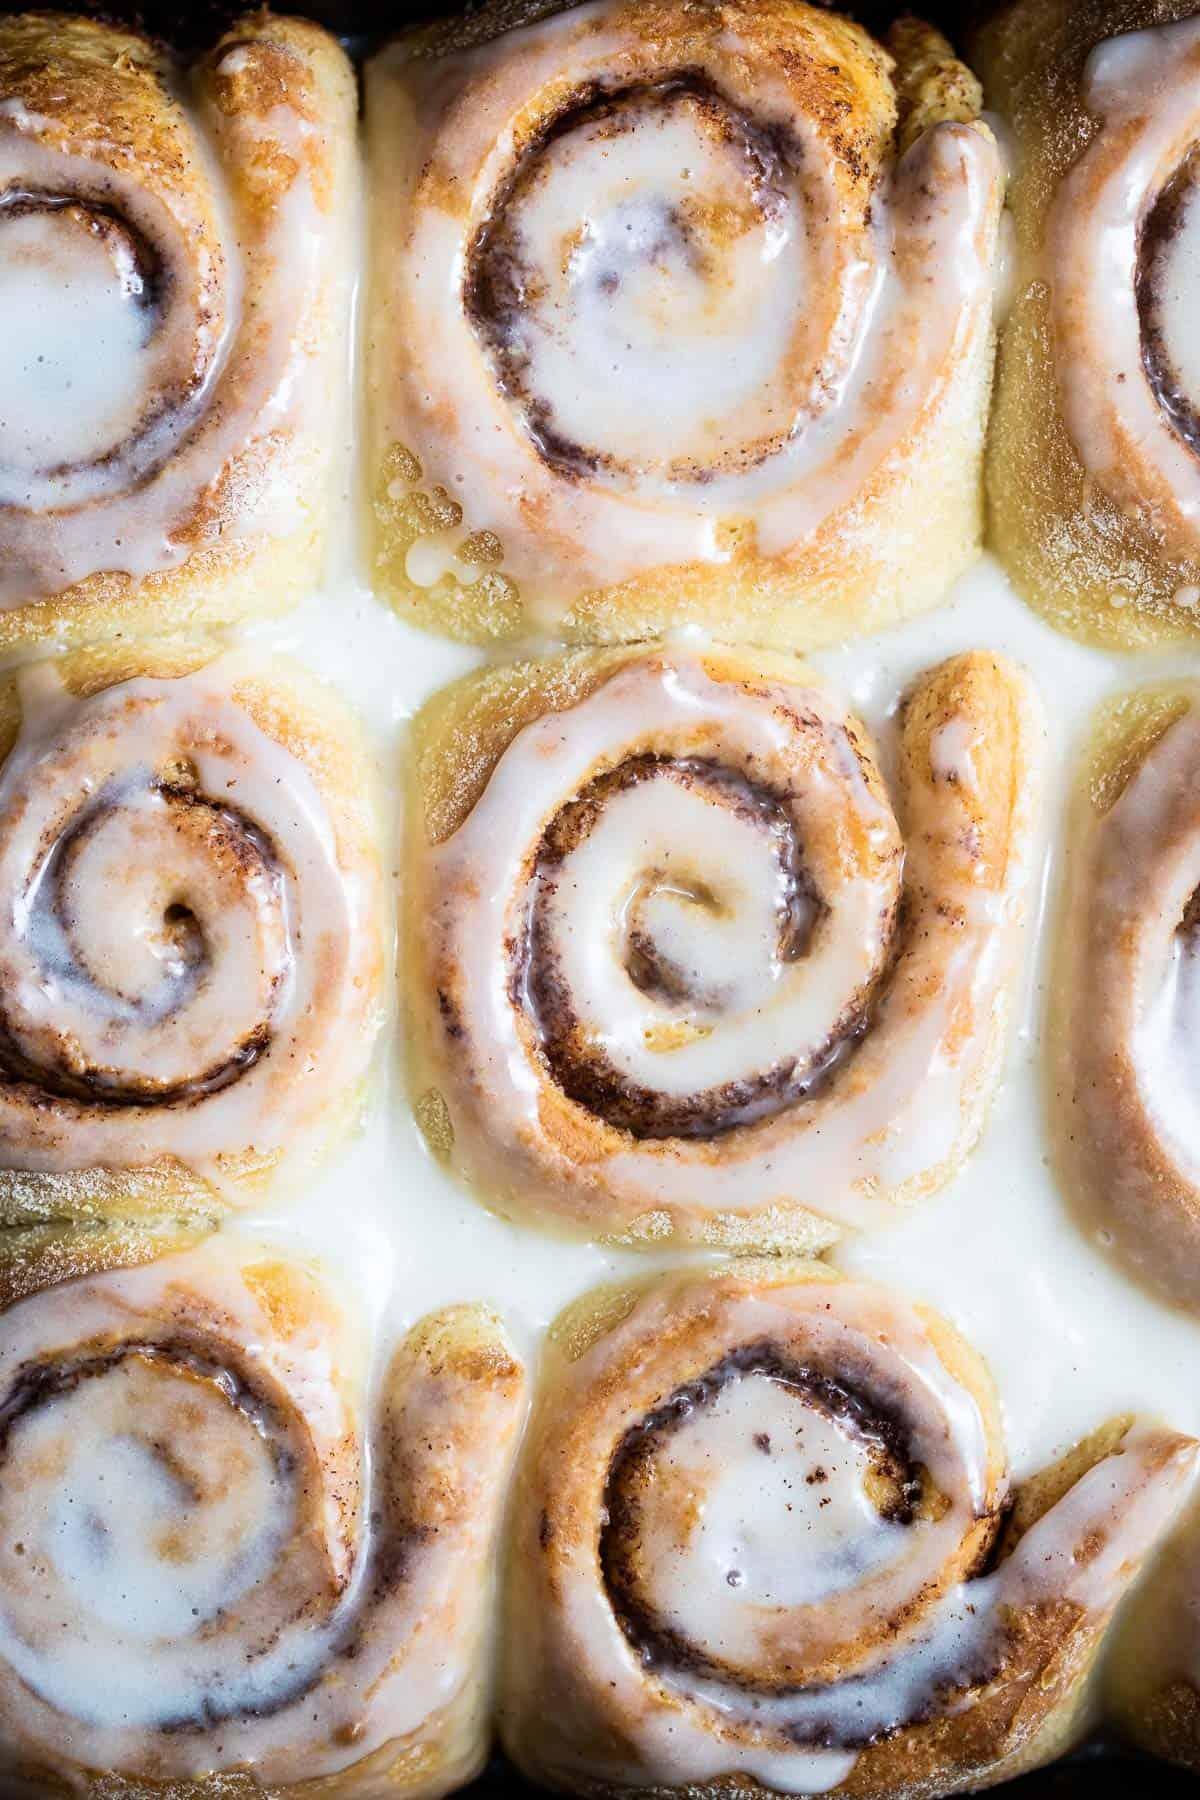 Close up shot of cinnamon buns